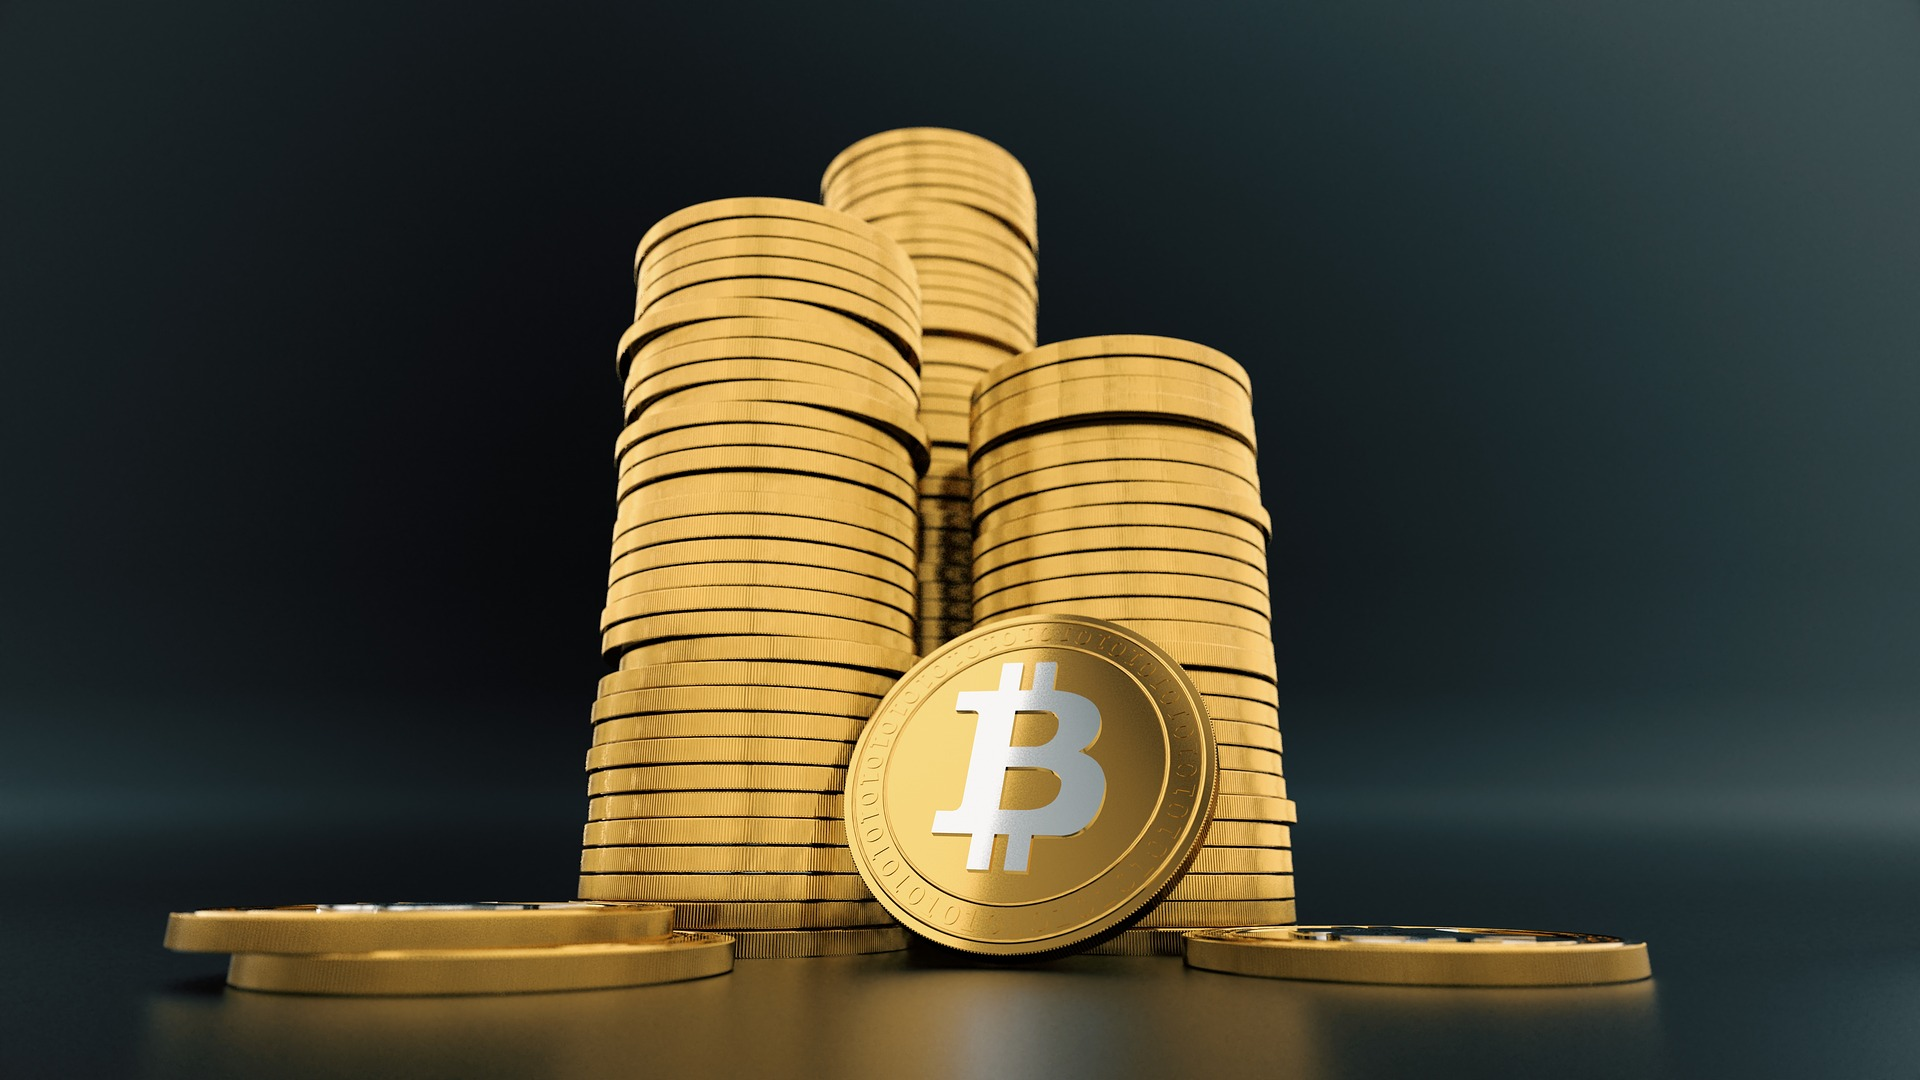 Tim Draper Cryptocurrency Trillion